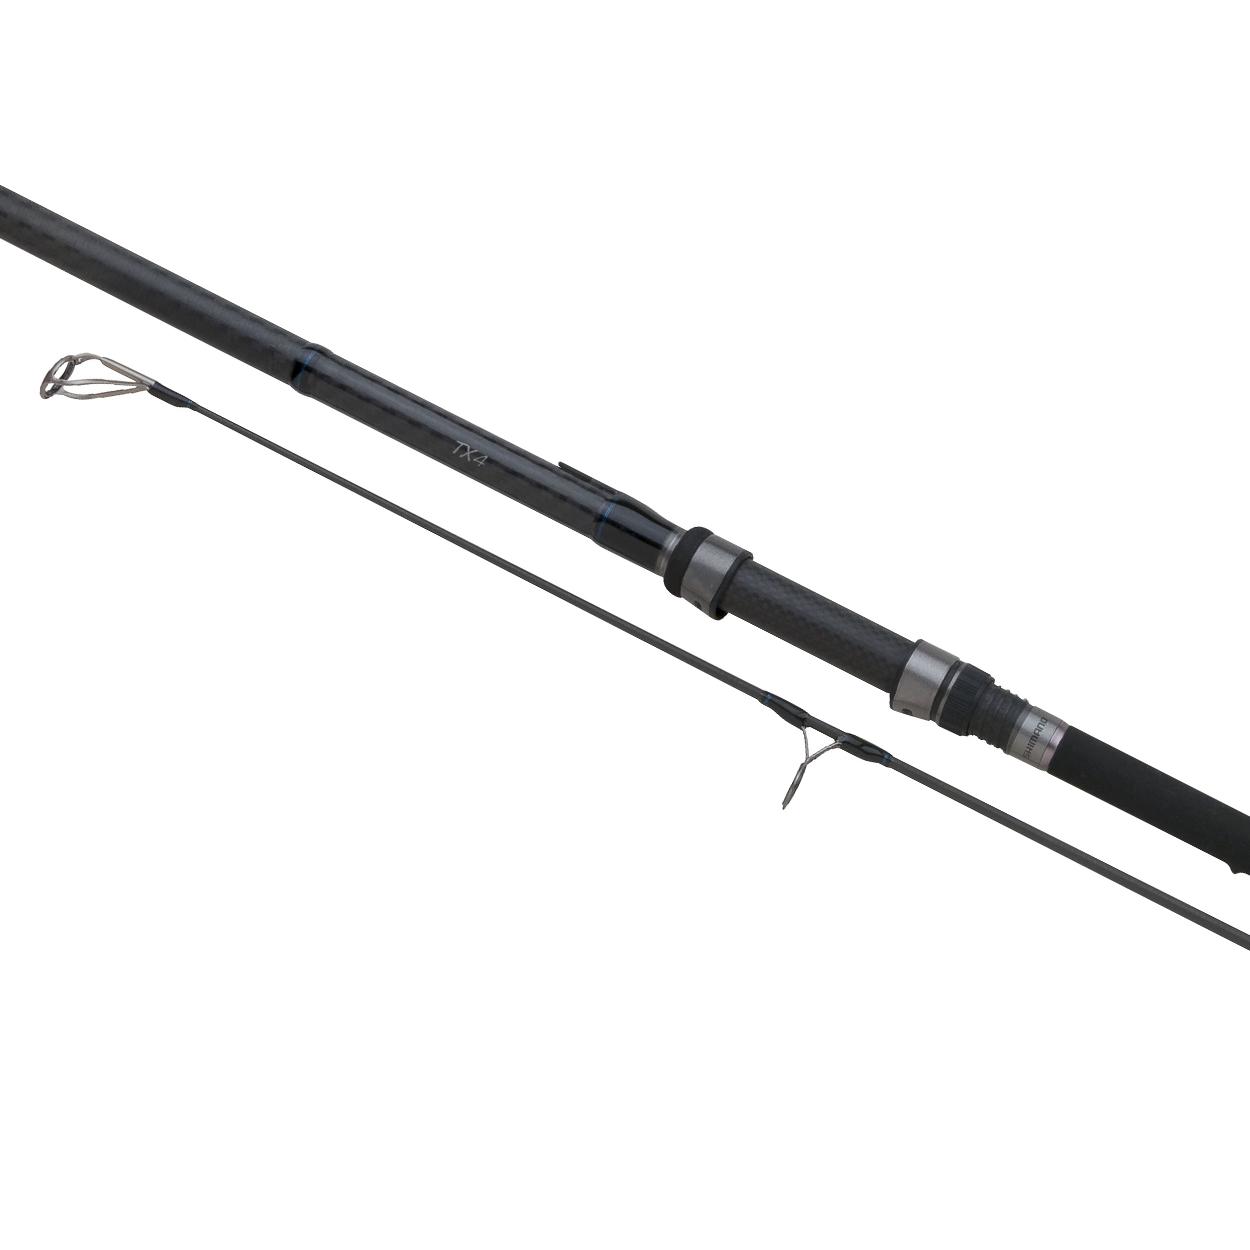 цена на Удилище карповое SHIMANO TRIBAL TX-4 13 INTENSITY (+ Леска в подарок!)